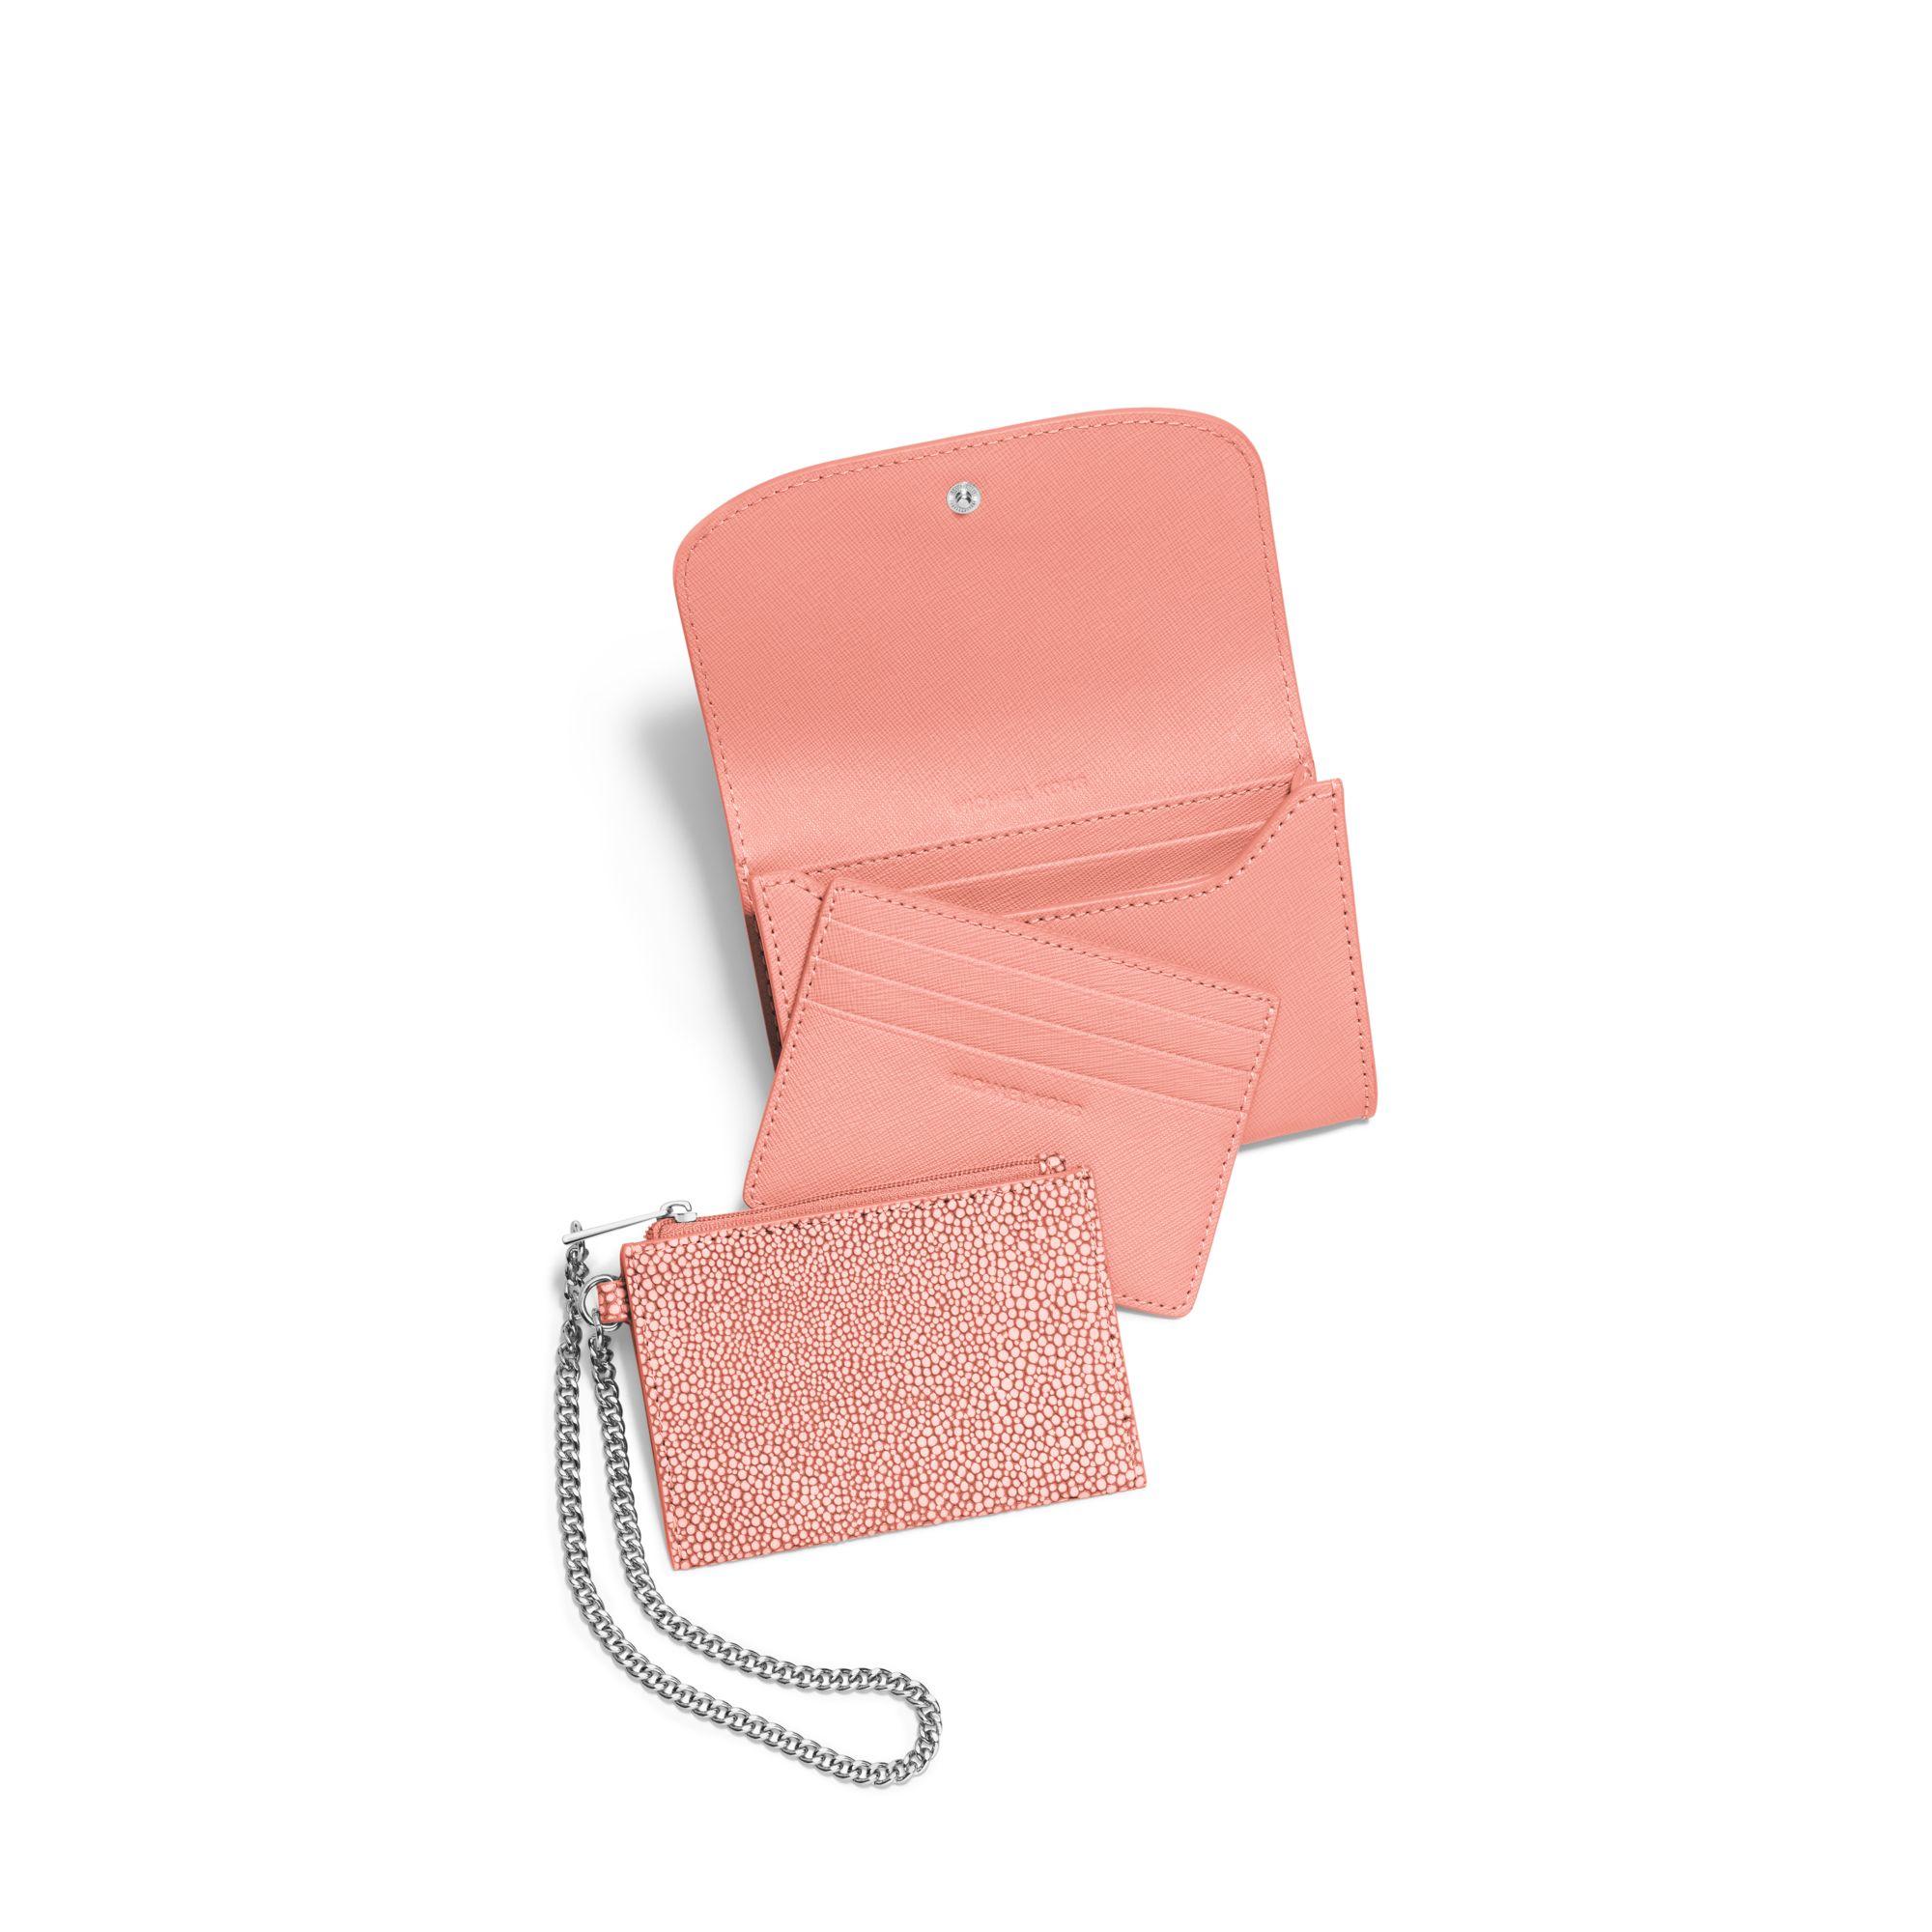 6530d1fc430e Lyst - Michael Kors Juliana Medium 3-in-1 Saffiano Leather Wallet in ...